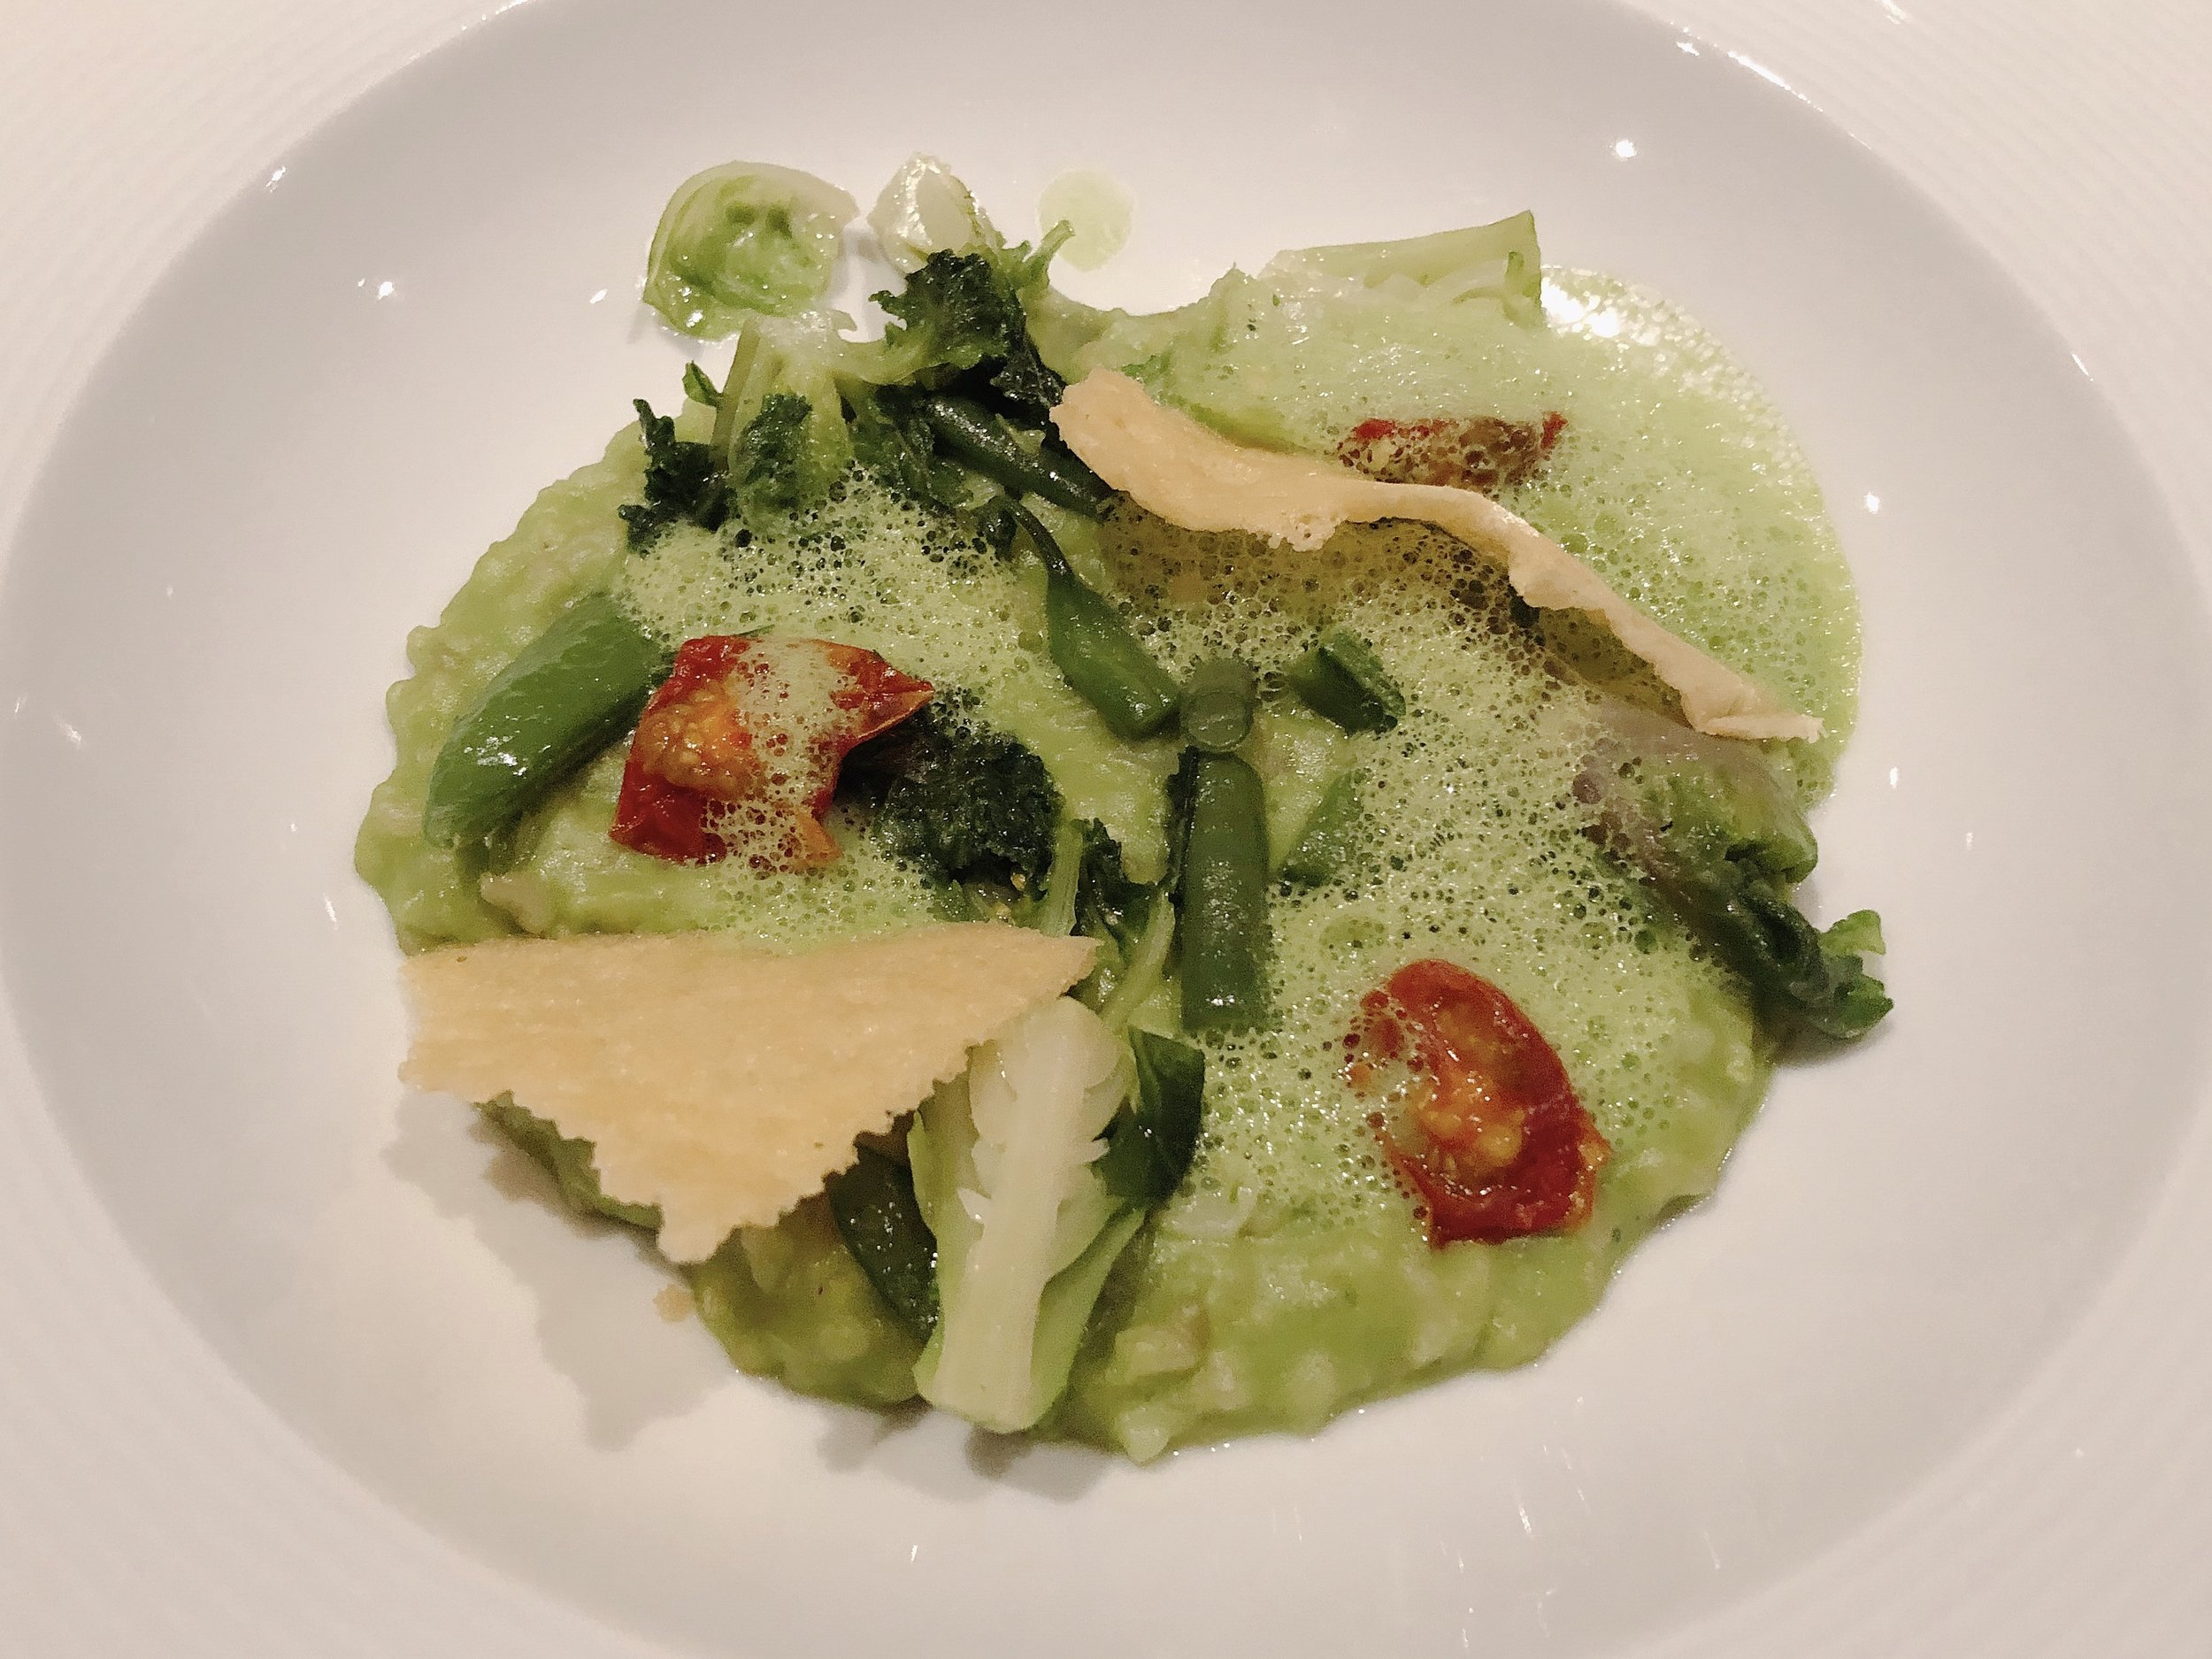 Kyoto Brown Rice Risotto + Spring Vegetables + Pea Foam + Parmesan Crisp (Vegetarian Option)